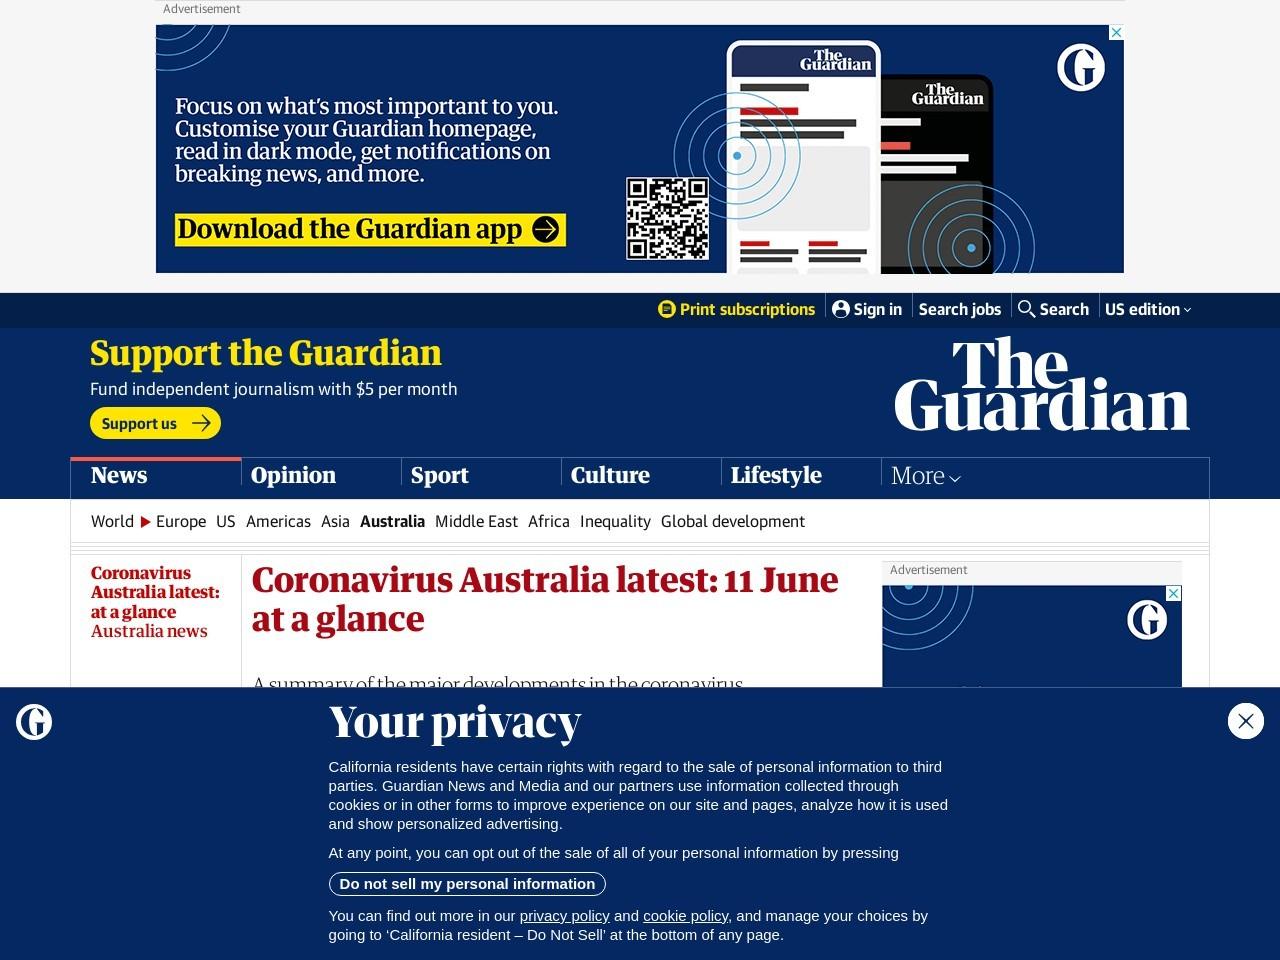 Coronavirus Australia latest: at a glance